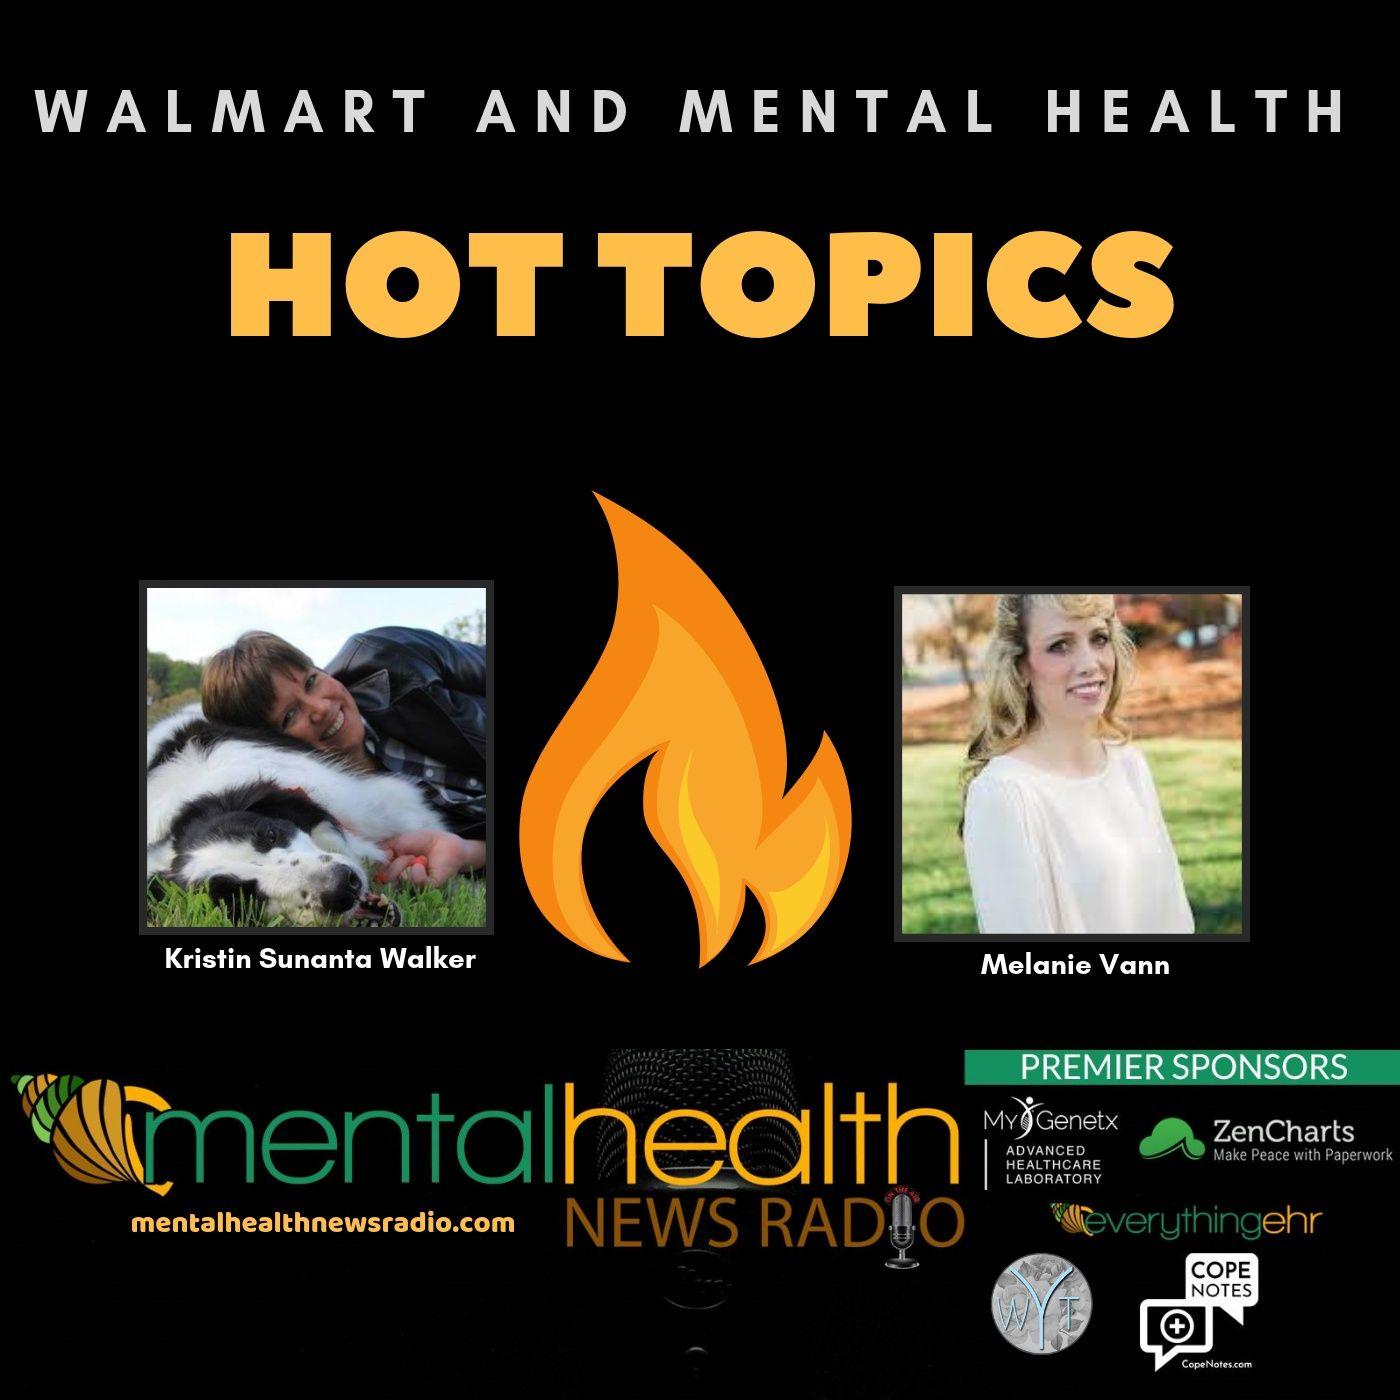 Mental Health News Radio - Hot Topics: Walmart and Mental Health